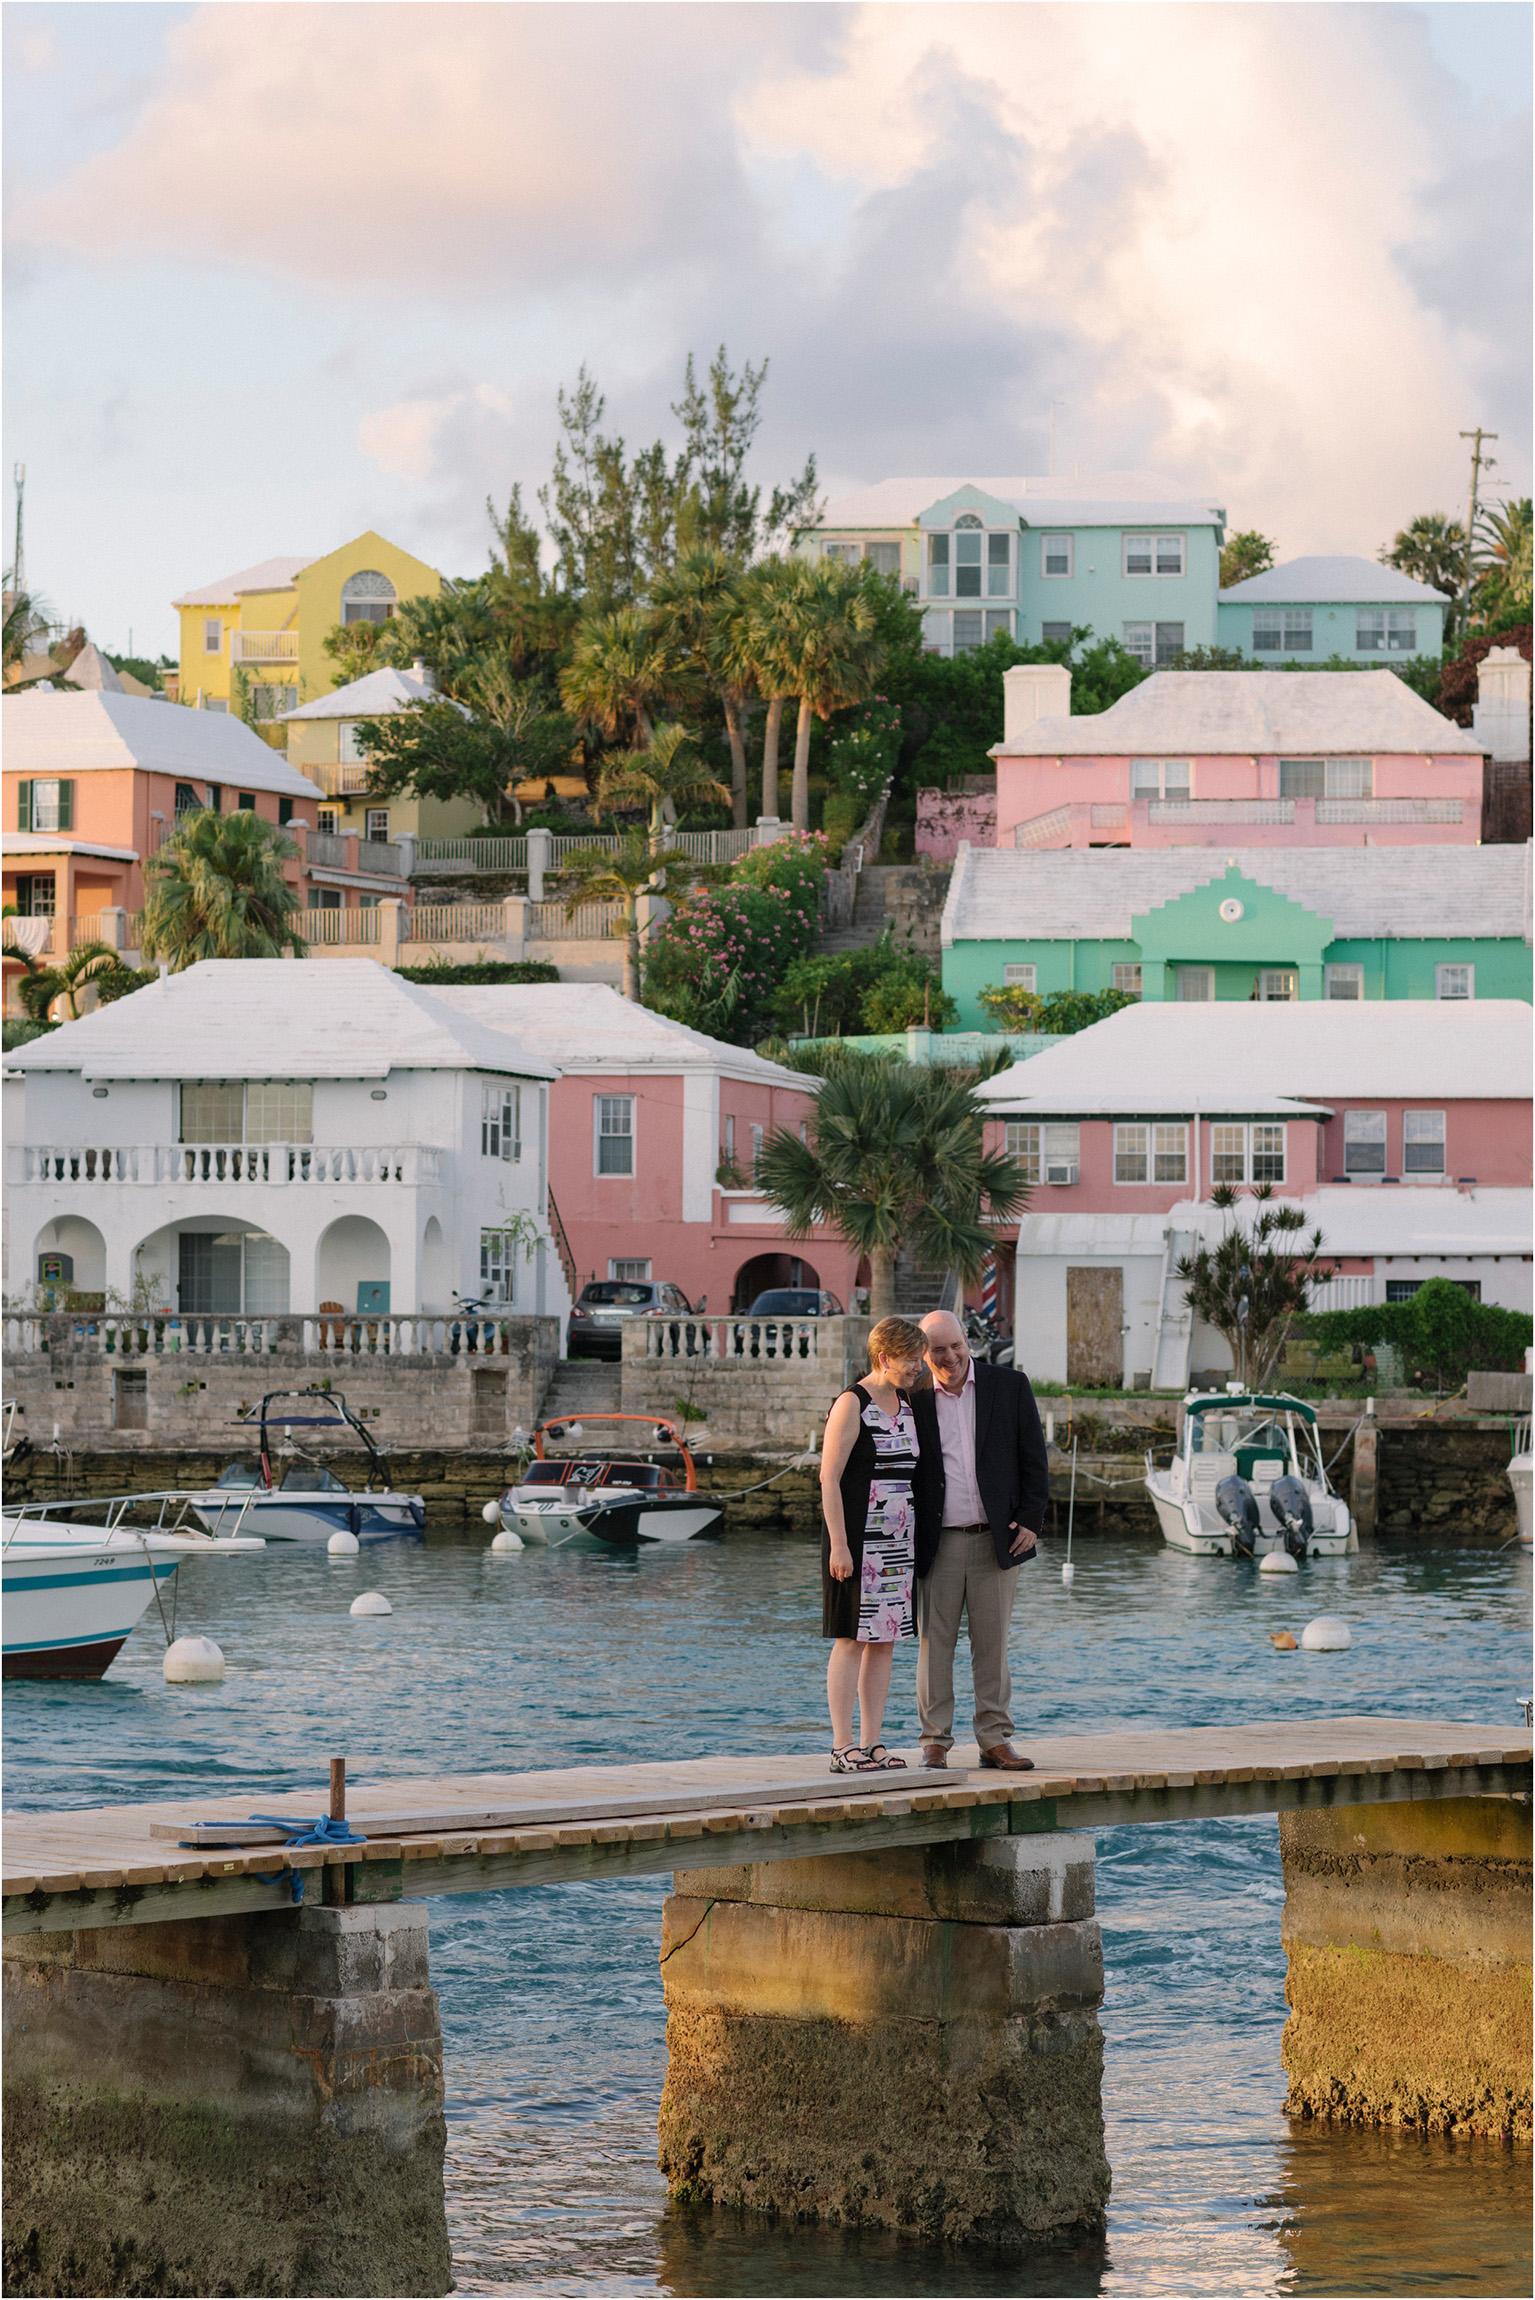 ©FianderFoto_Bermuda Photographer_Flatts Village_Cooper's Island_Andrea_018.jpg